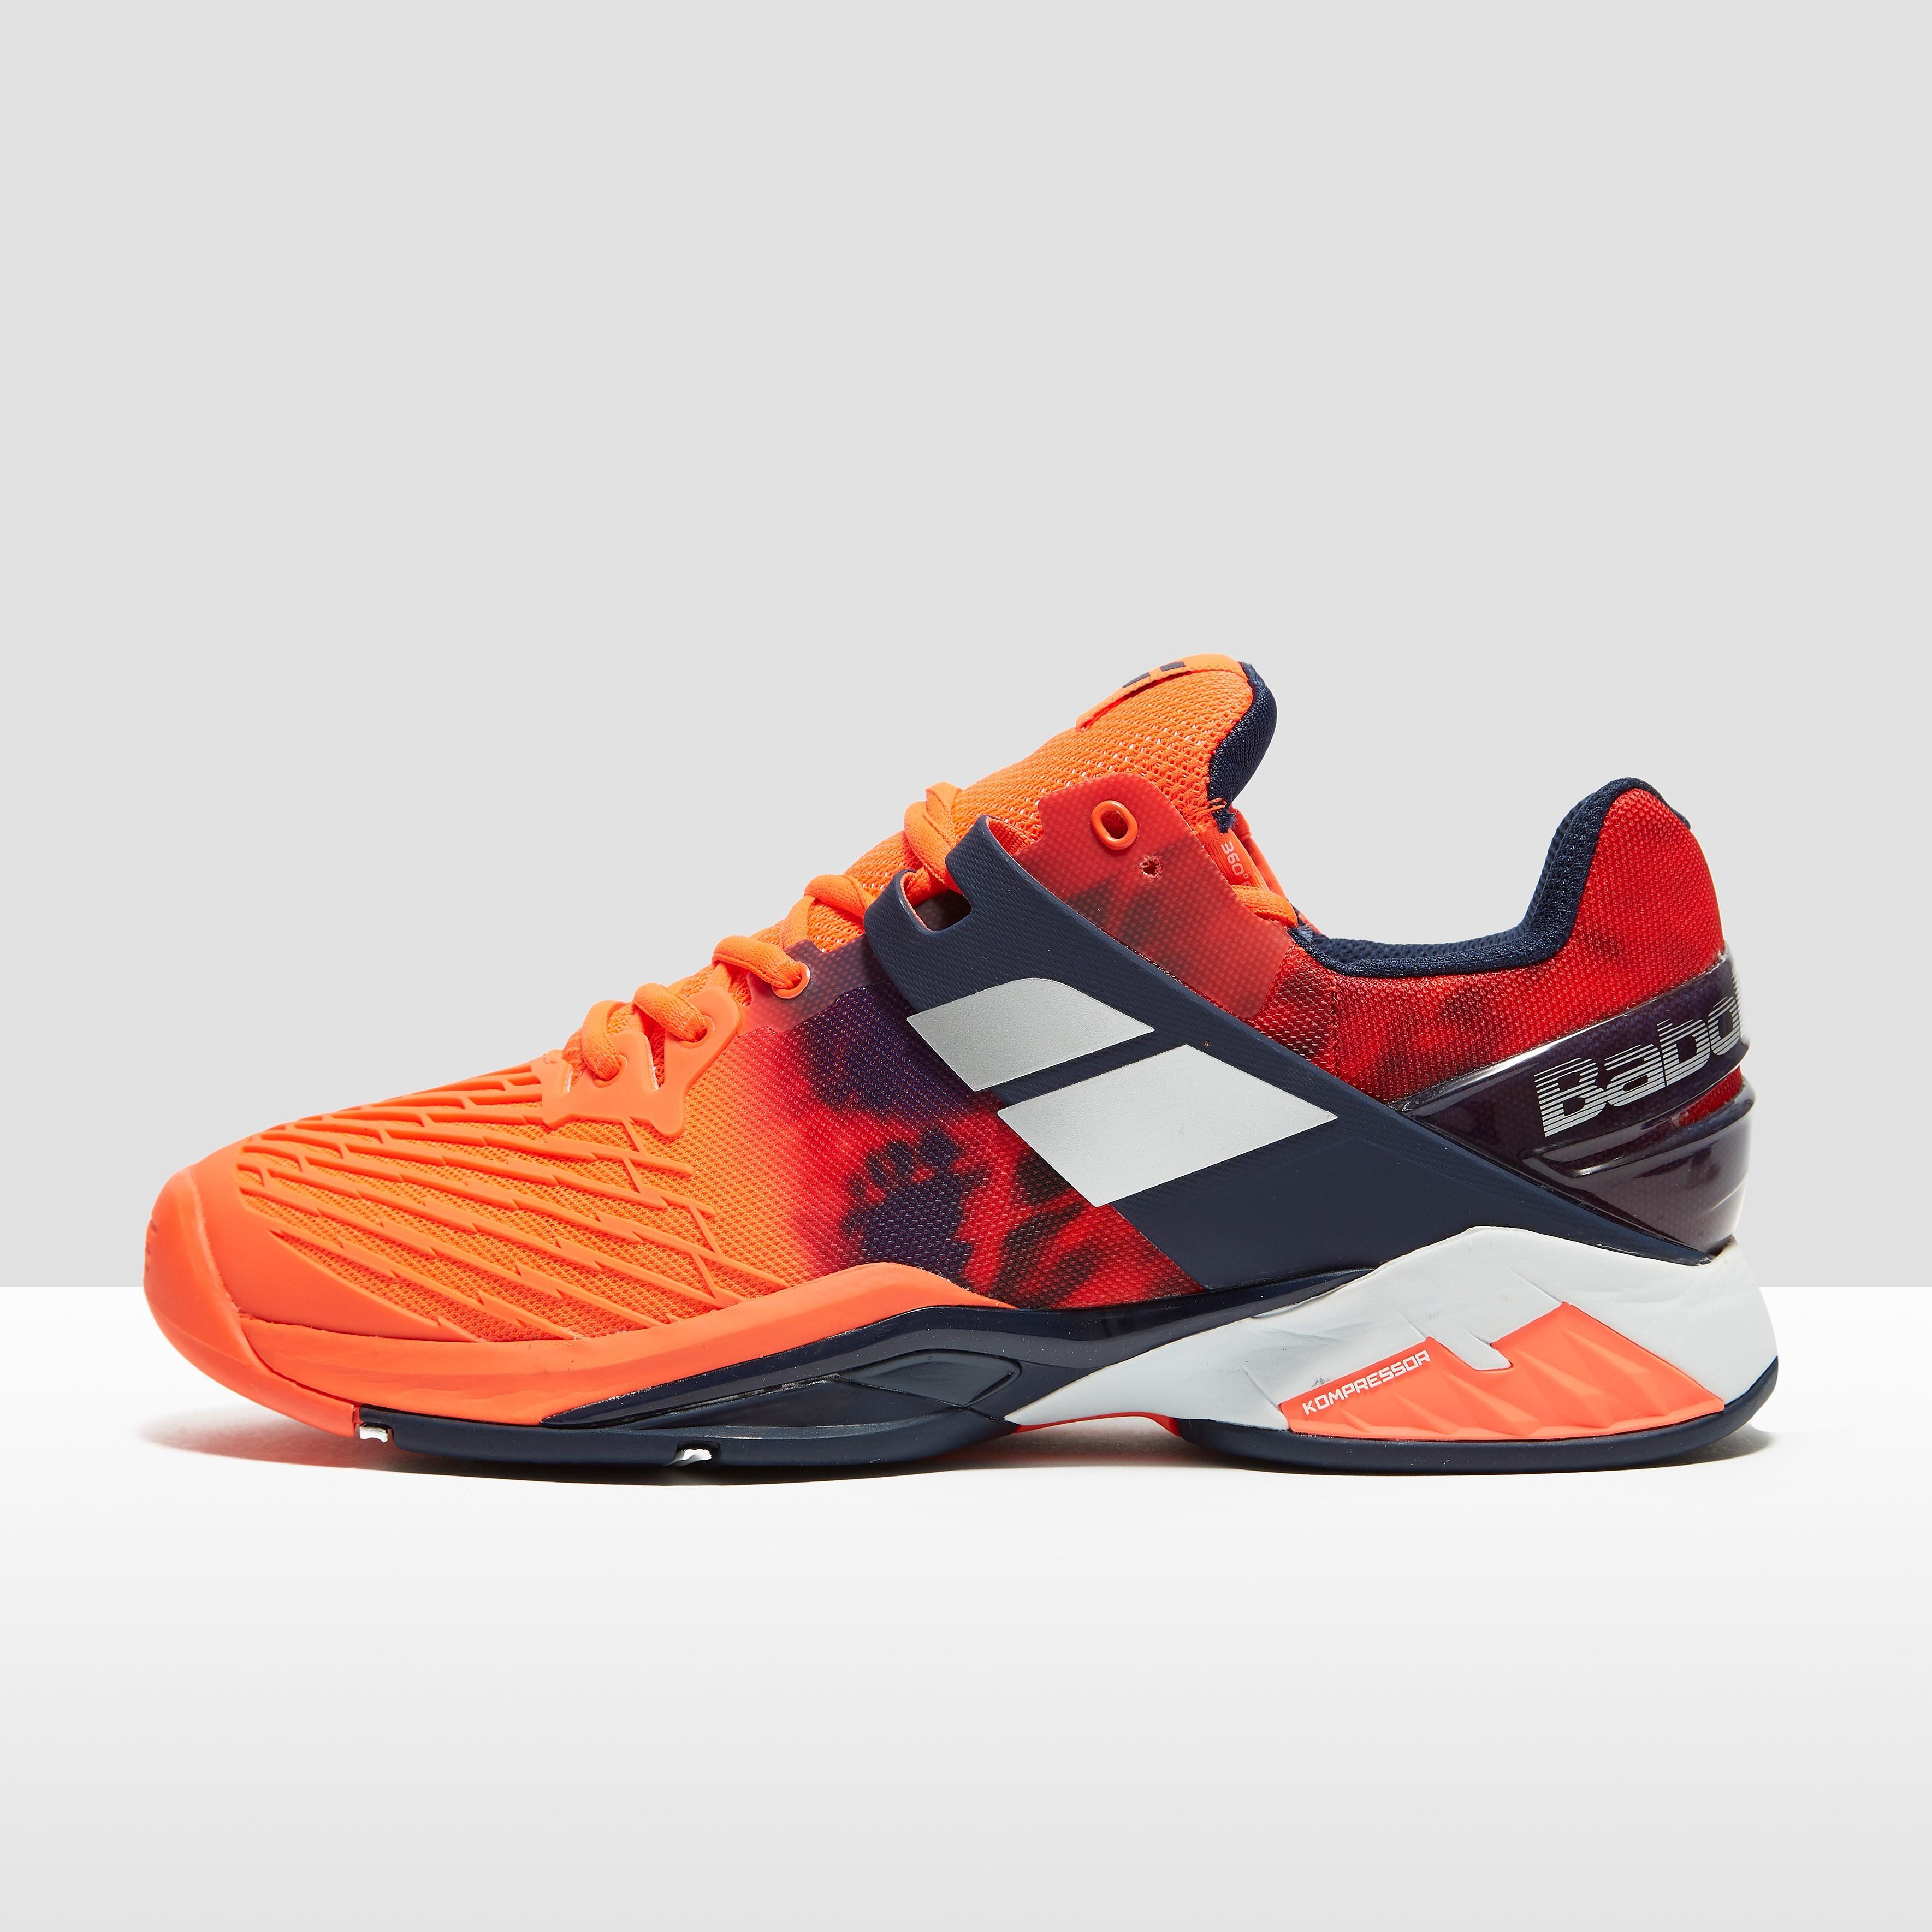 Babolat Propulse Fury All Court Men's Tennis Shoes